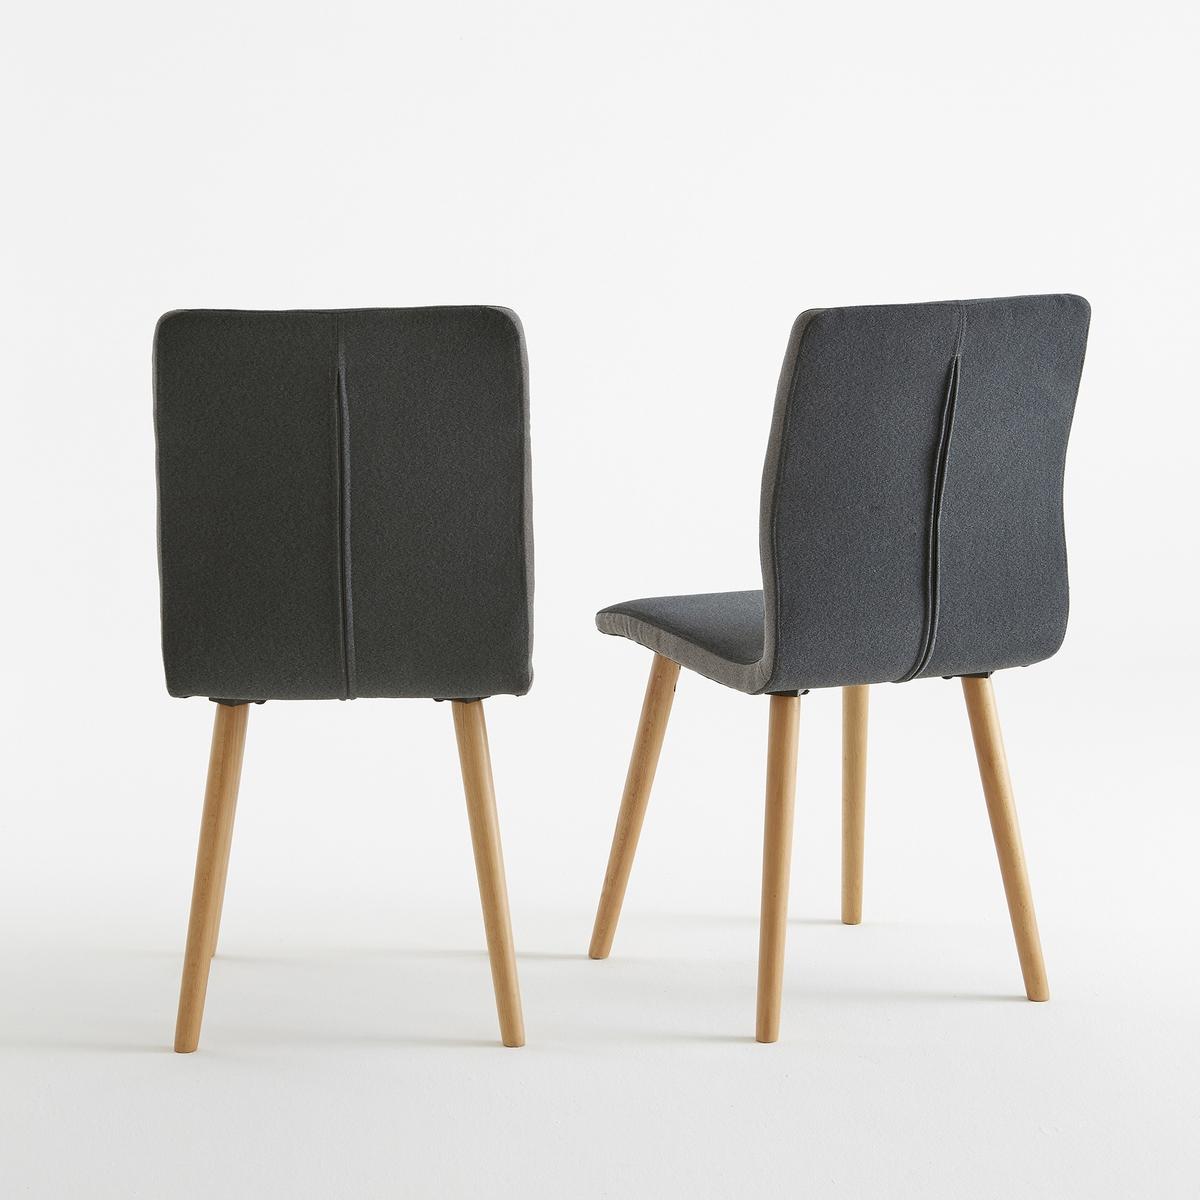 2 стула с мягкой спинкой, CRUESO